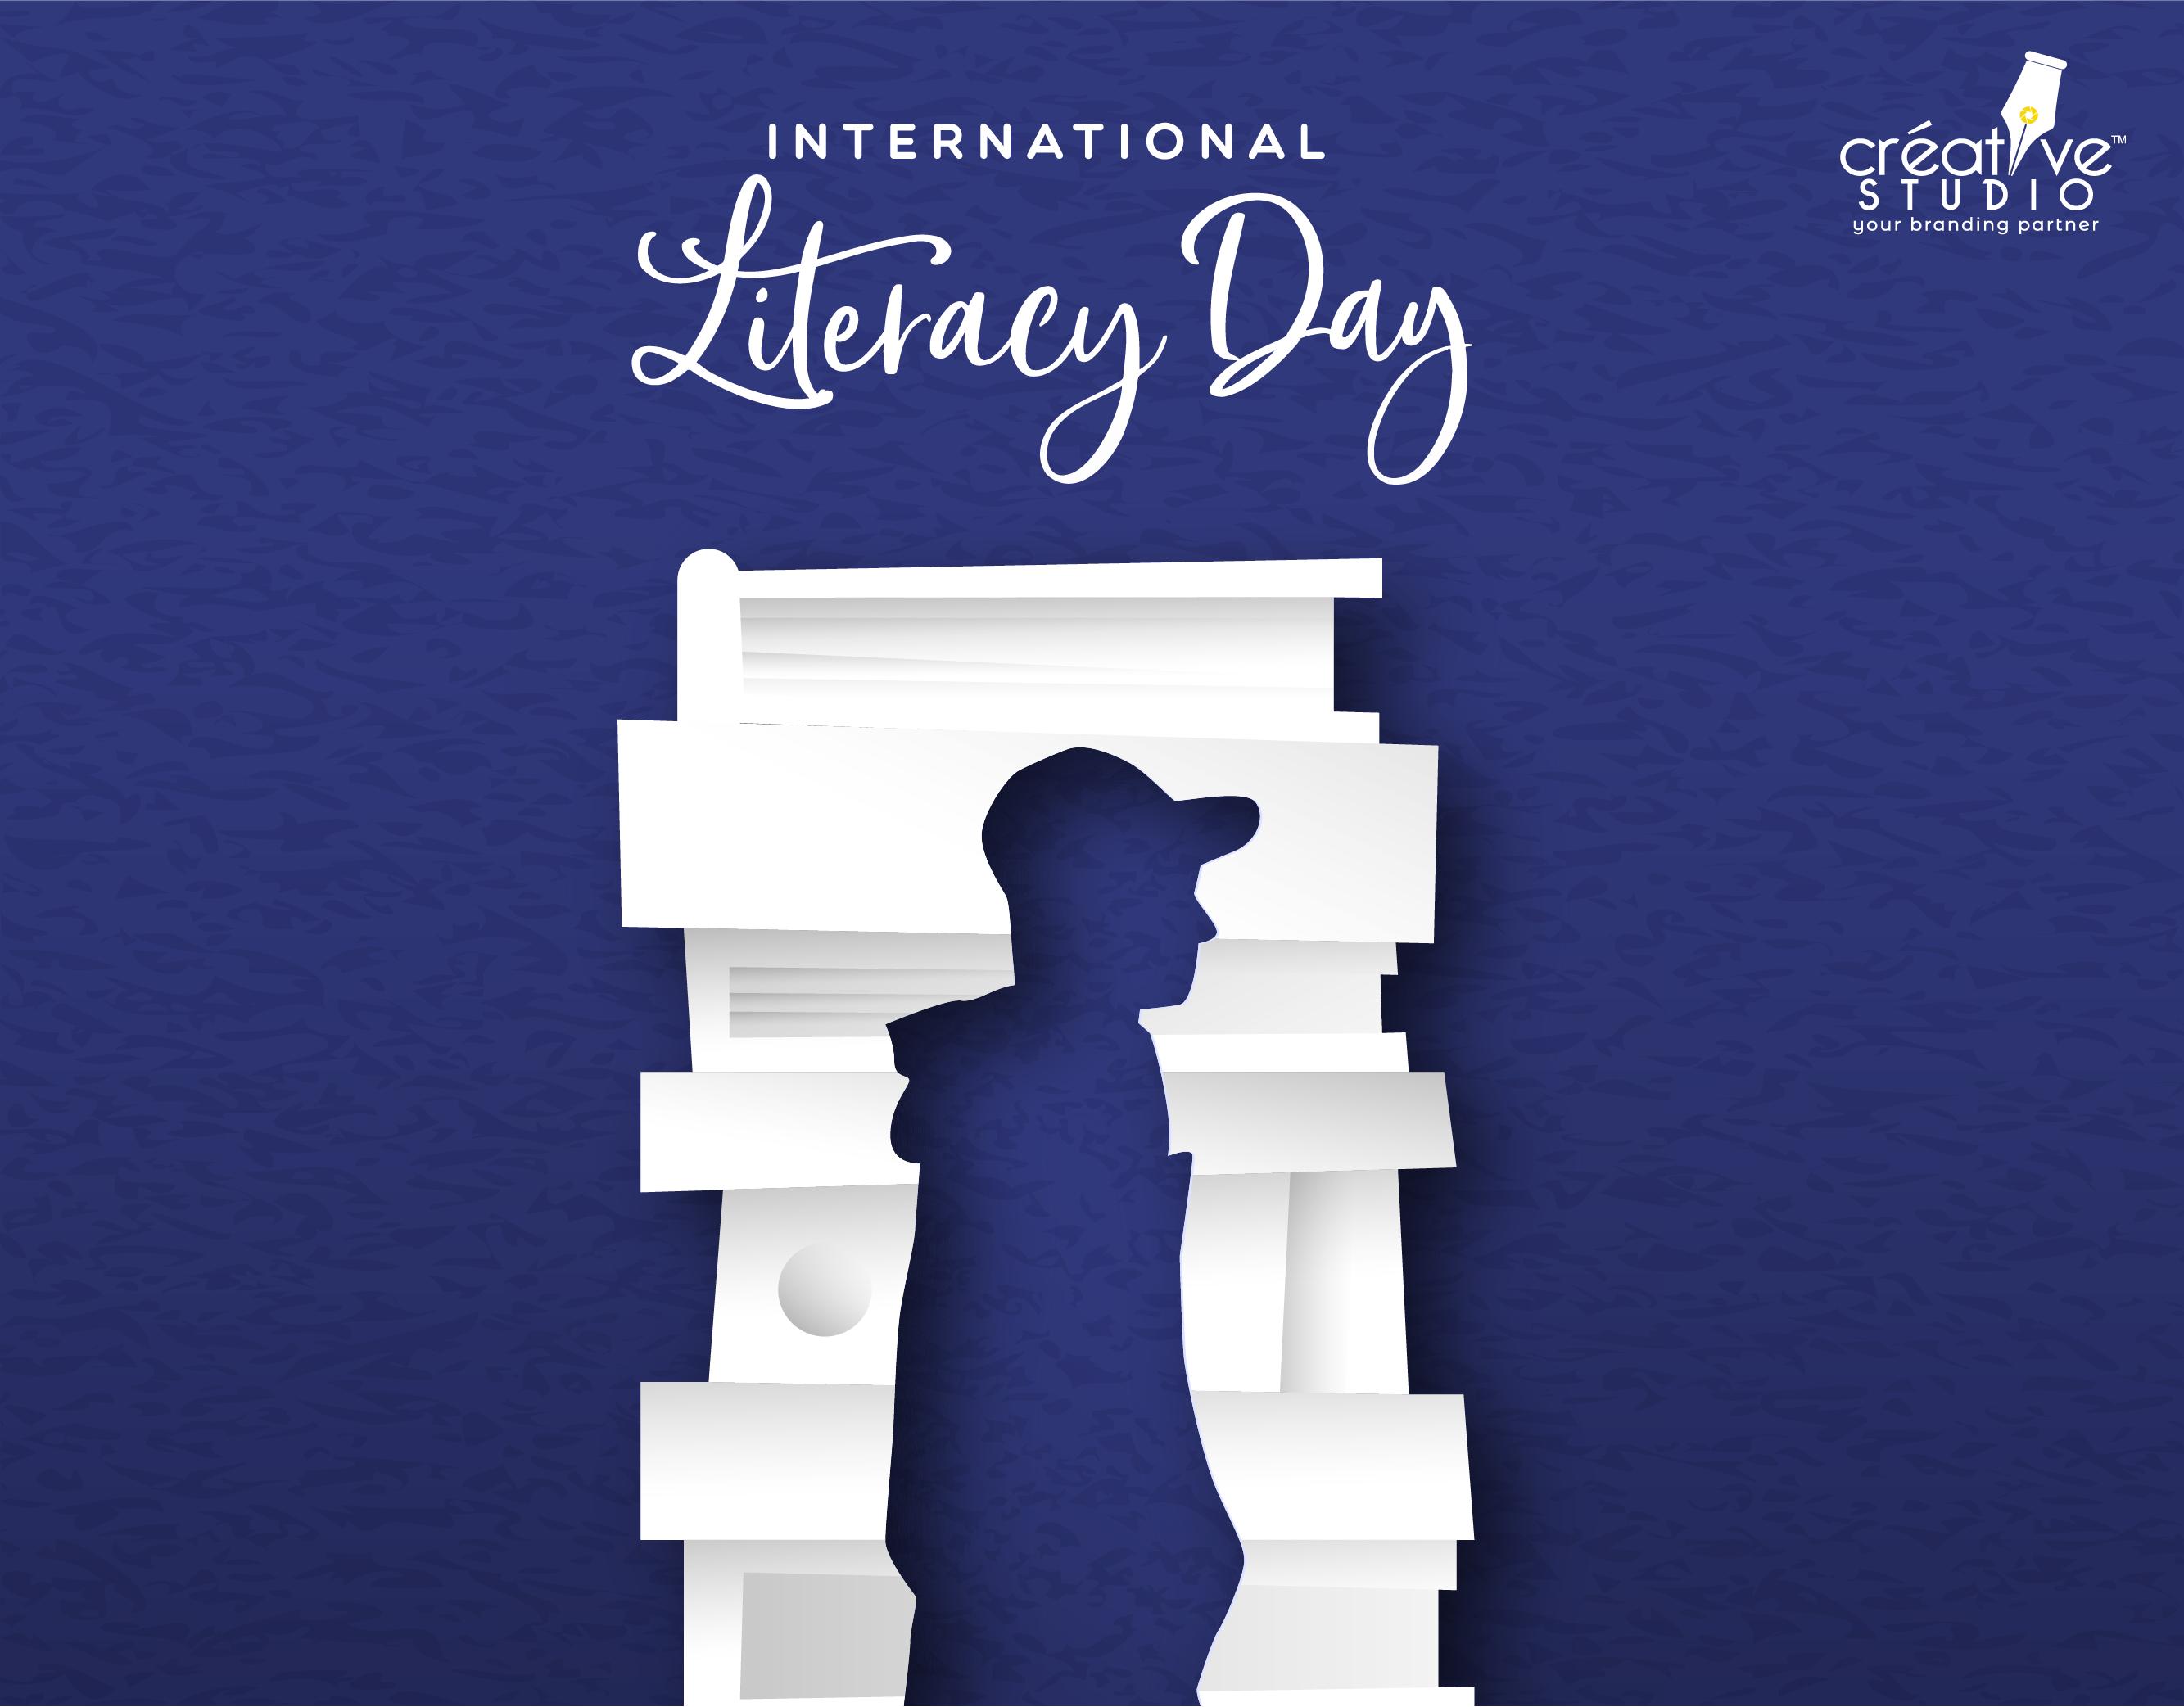 LITERACY DAY 04 - Literacy Day